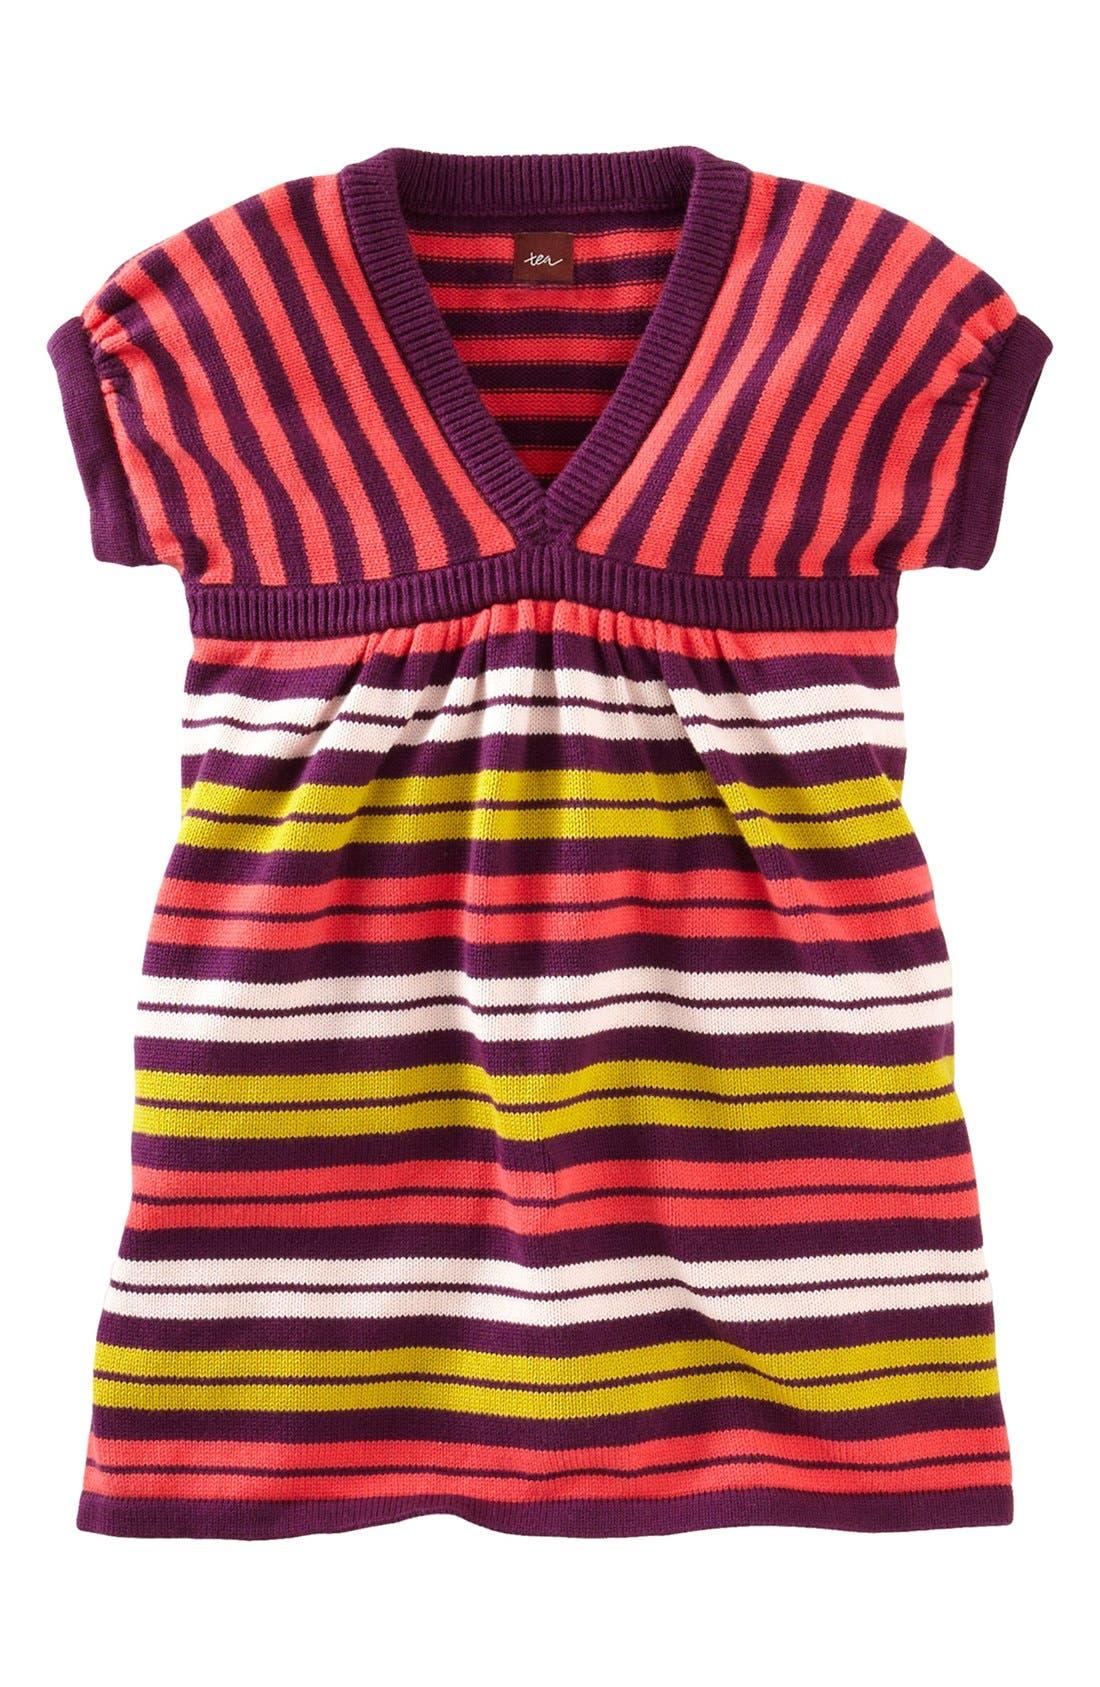 Alternate Image 1 Selected - Tea Collection 'Art Village' Sweater Dress (Little Girls & Big Girls)